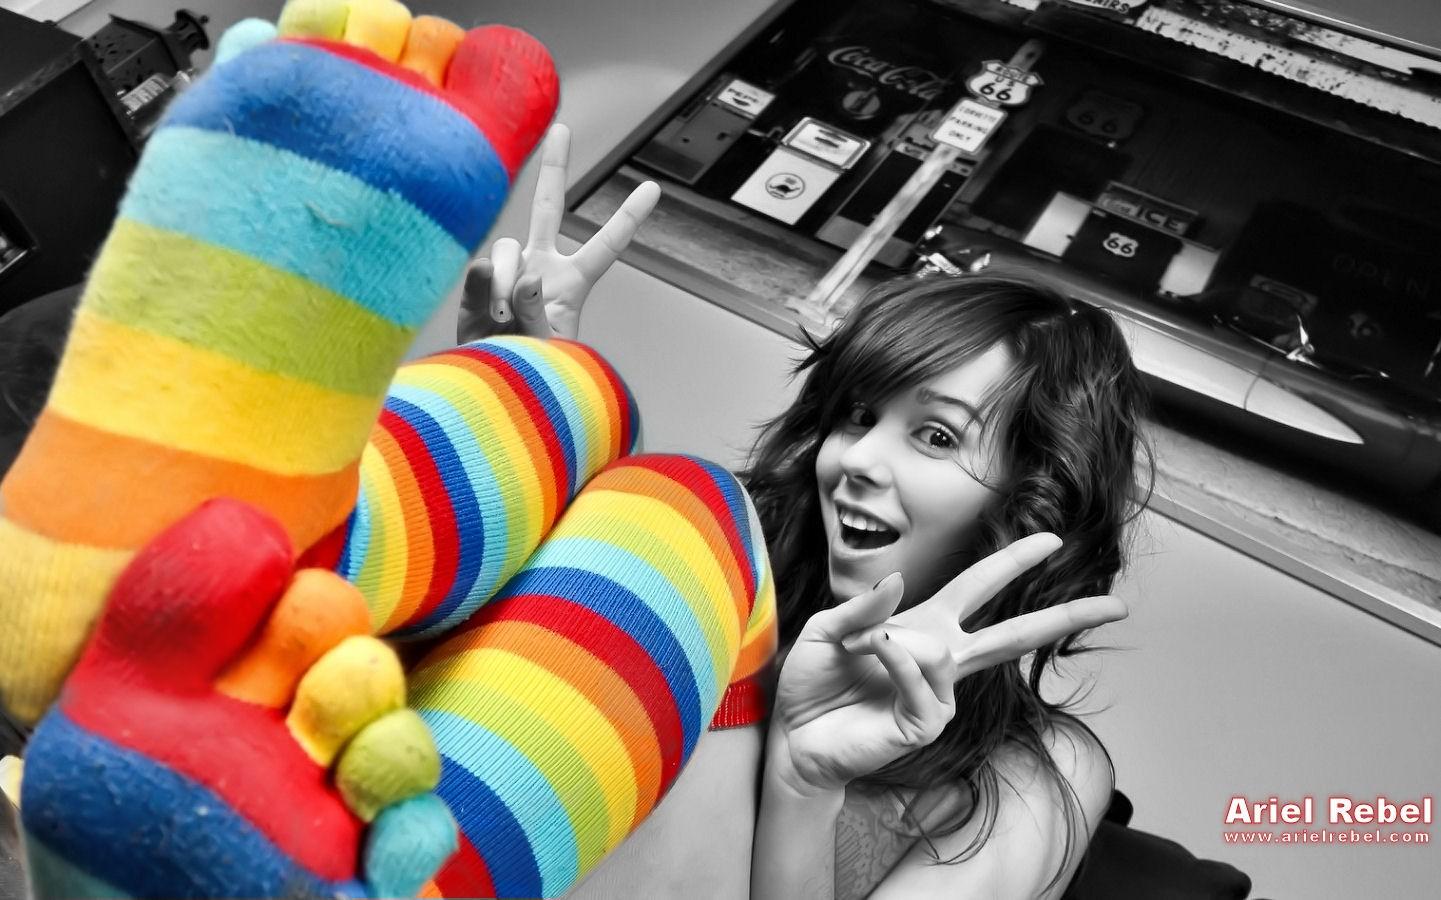 People 1441x900 Ariel Rebel women socks striped socks toe socks peace sign legs up feet in the air toes brunette bent legs rainbow clothing rainbow socks watermarked open mouth looking at viewer